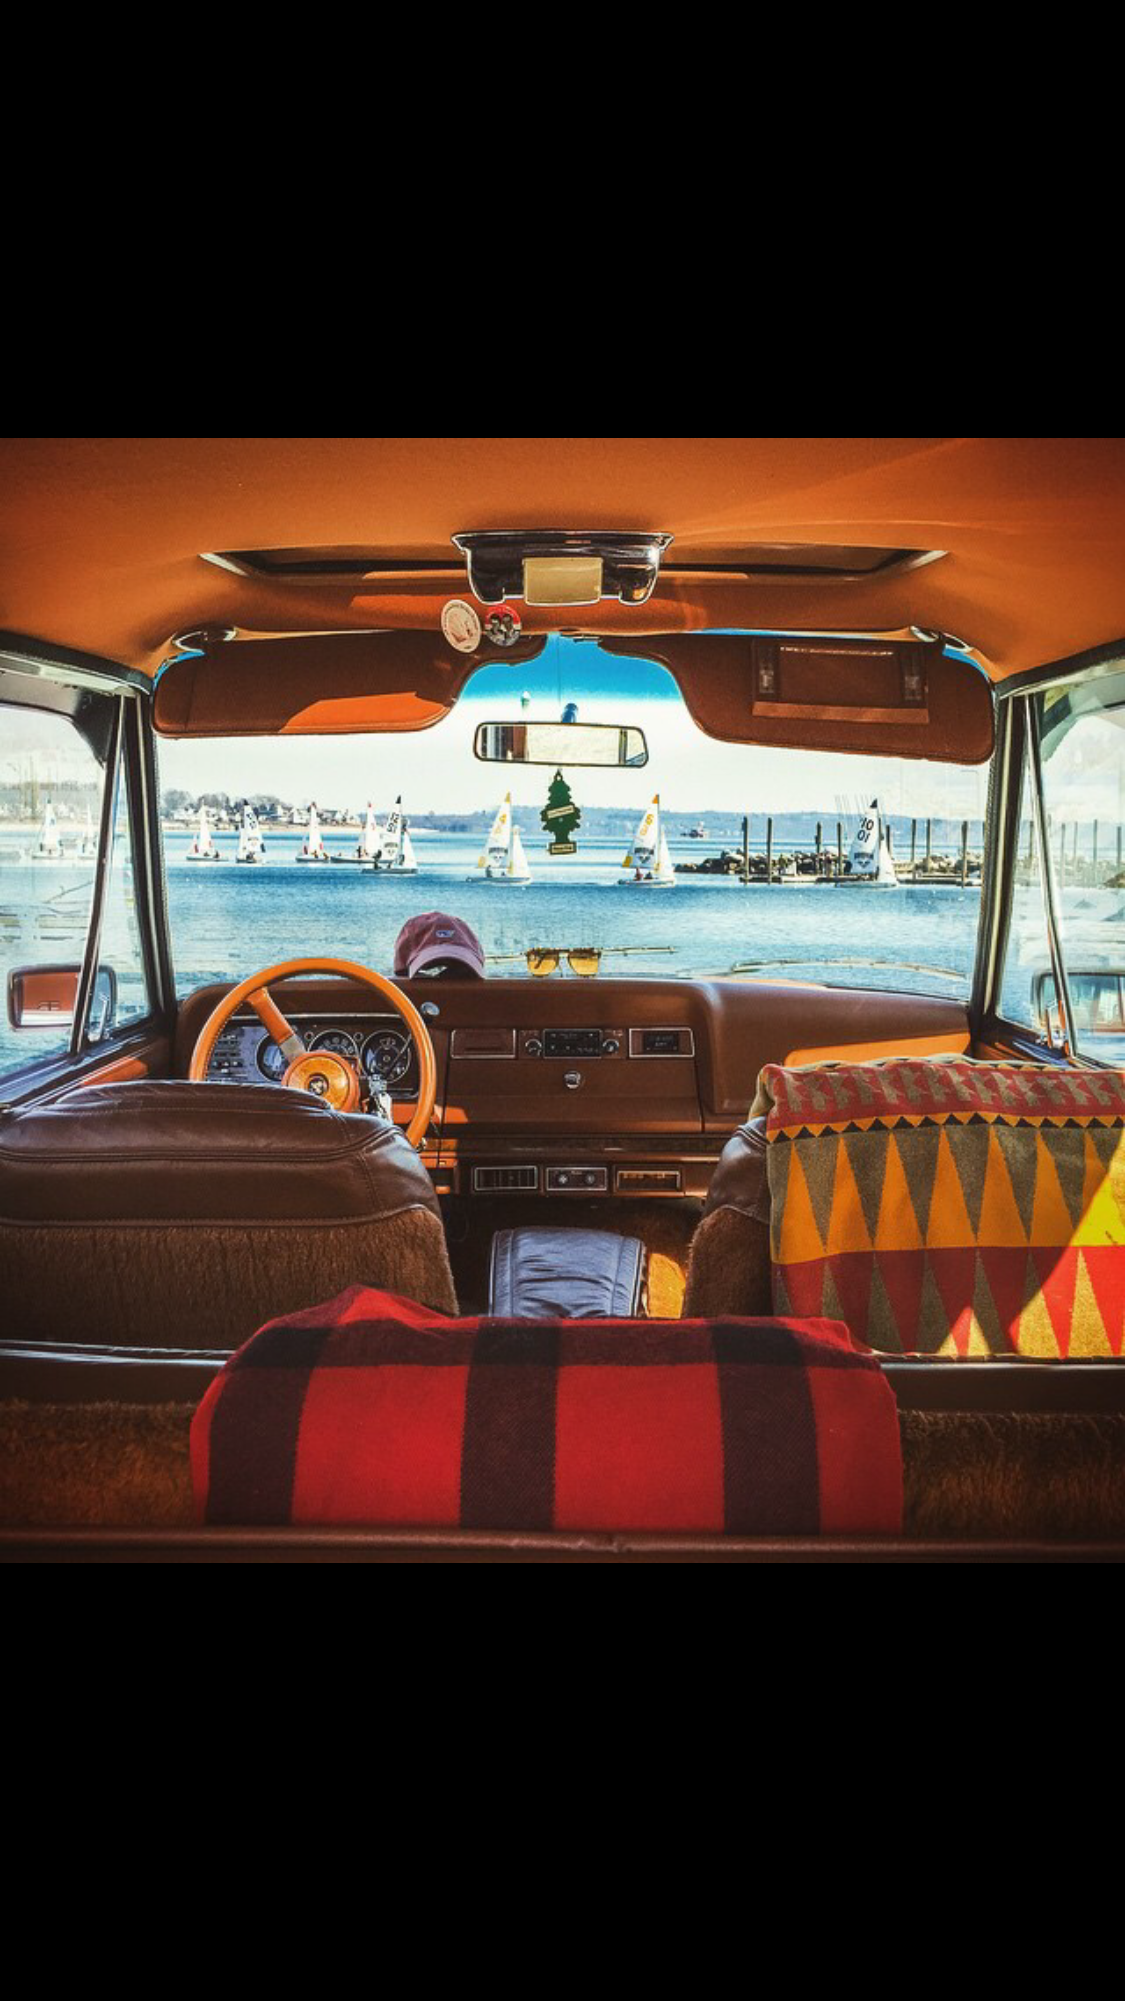 Pin by shannon bowman on Stuff I Like Jeep wagoneer